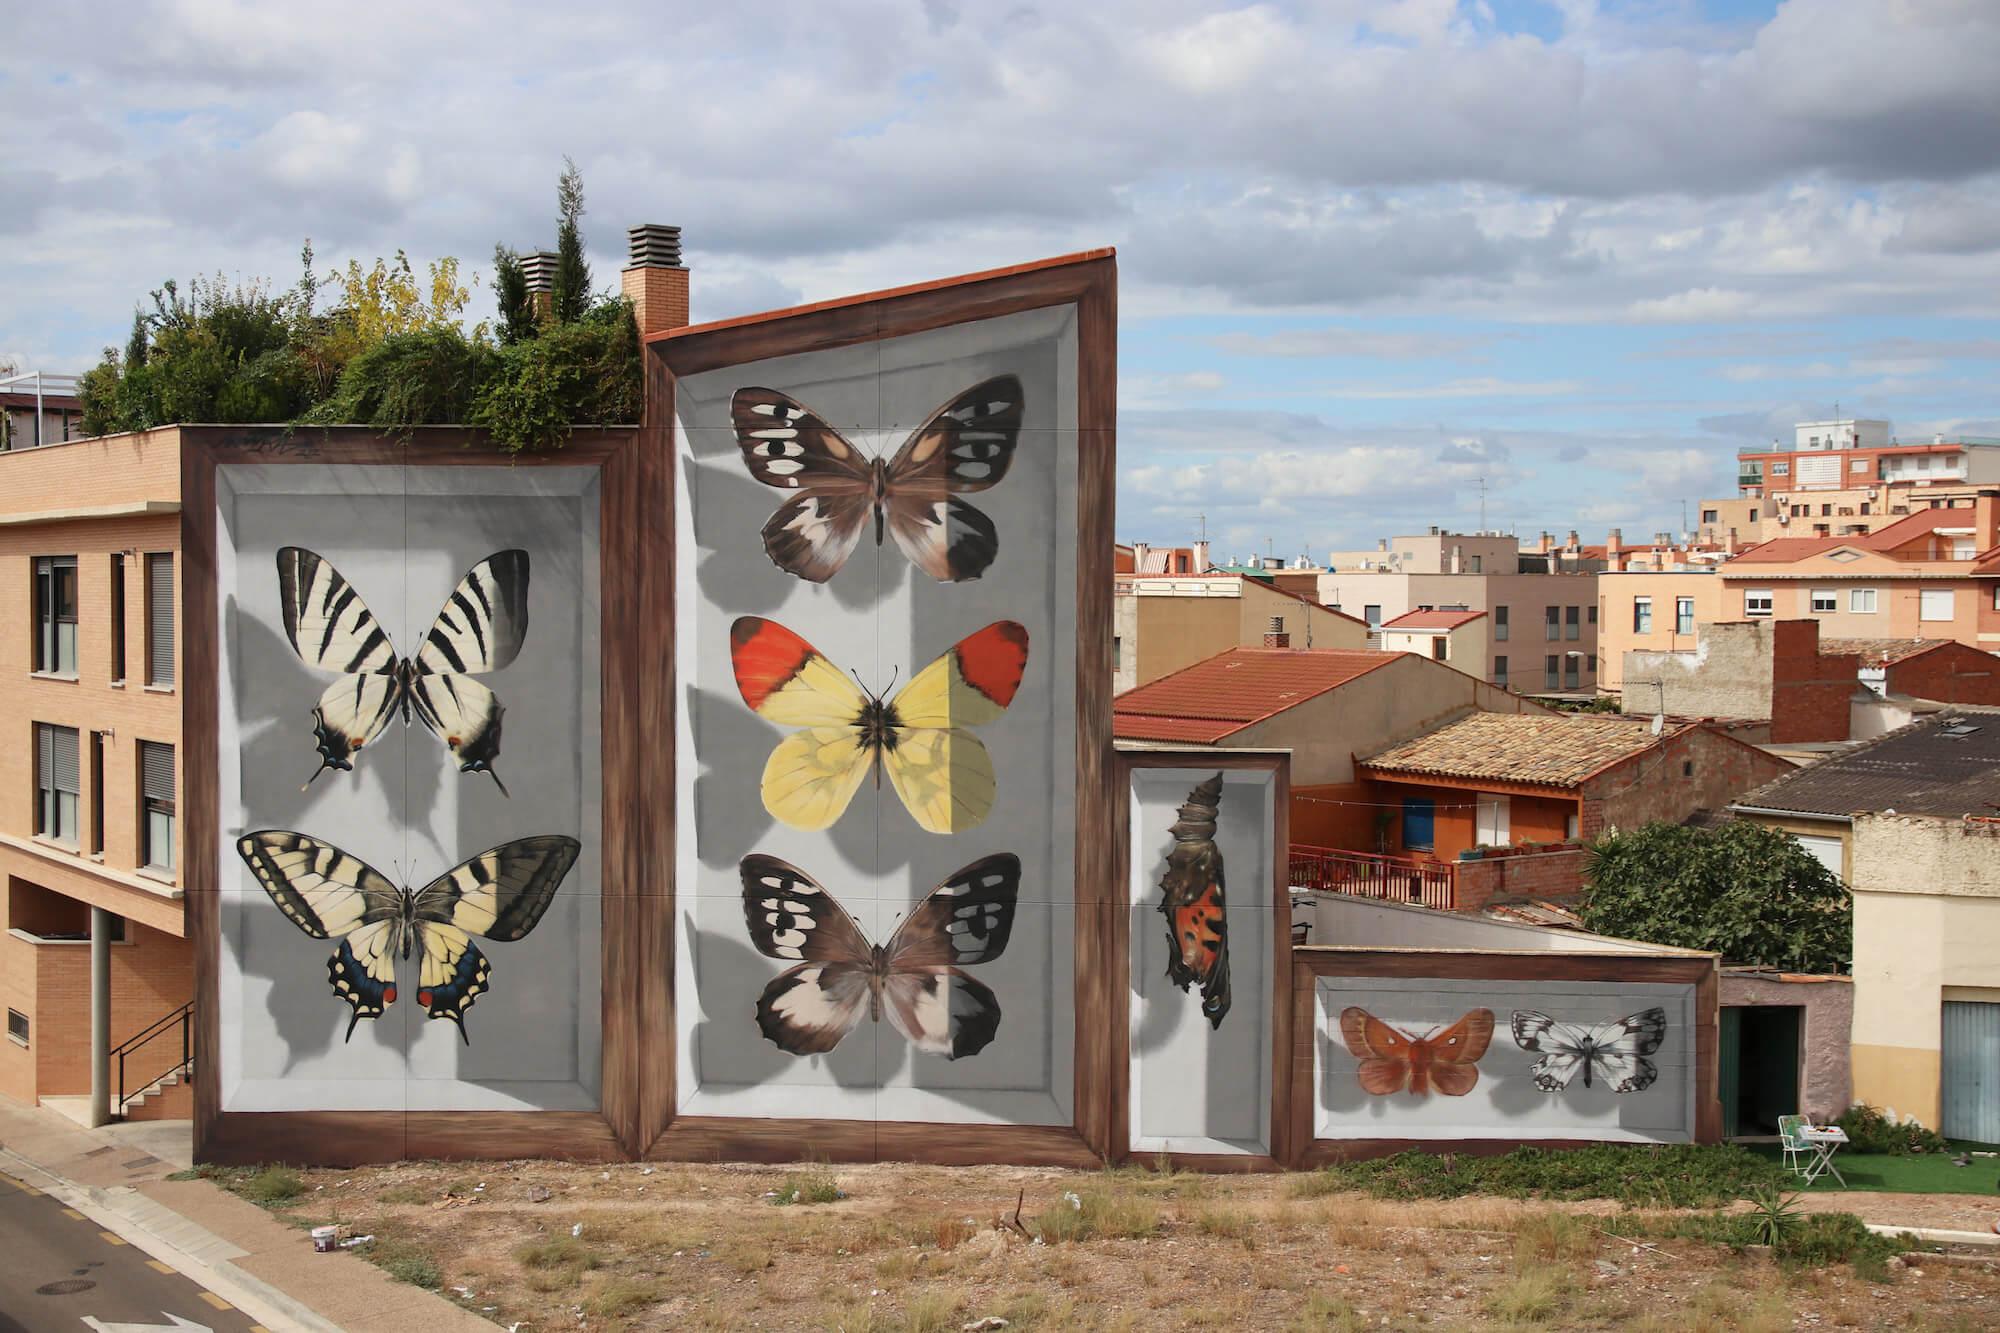 Remarquable Asalto Urban Art Festival, Zaragoza, Spain 2017 WI-27